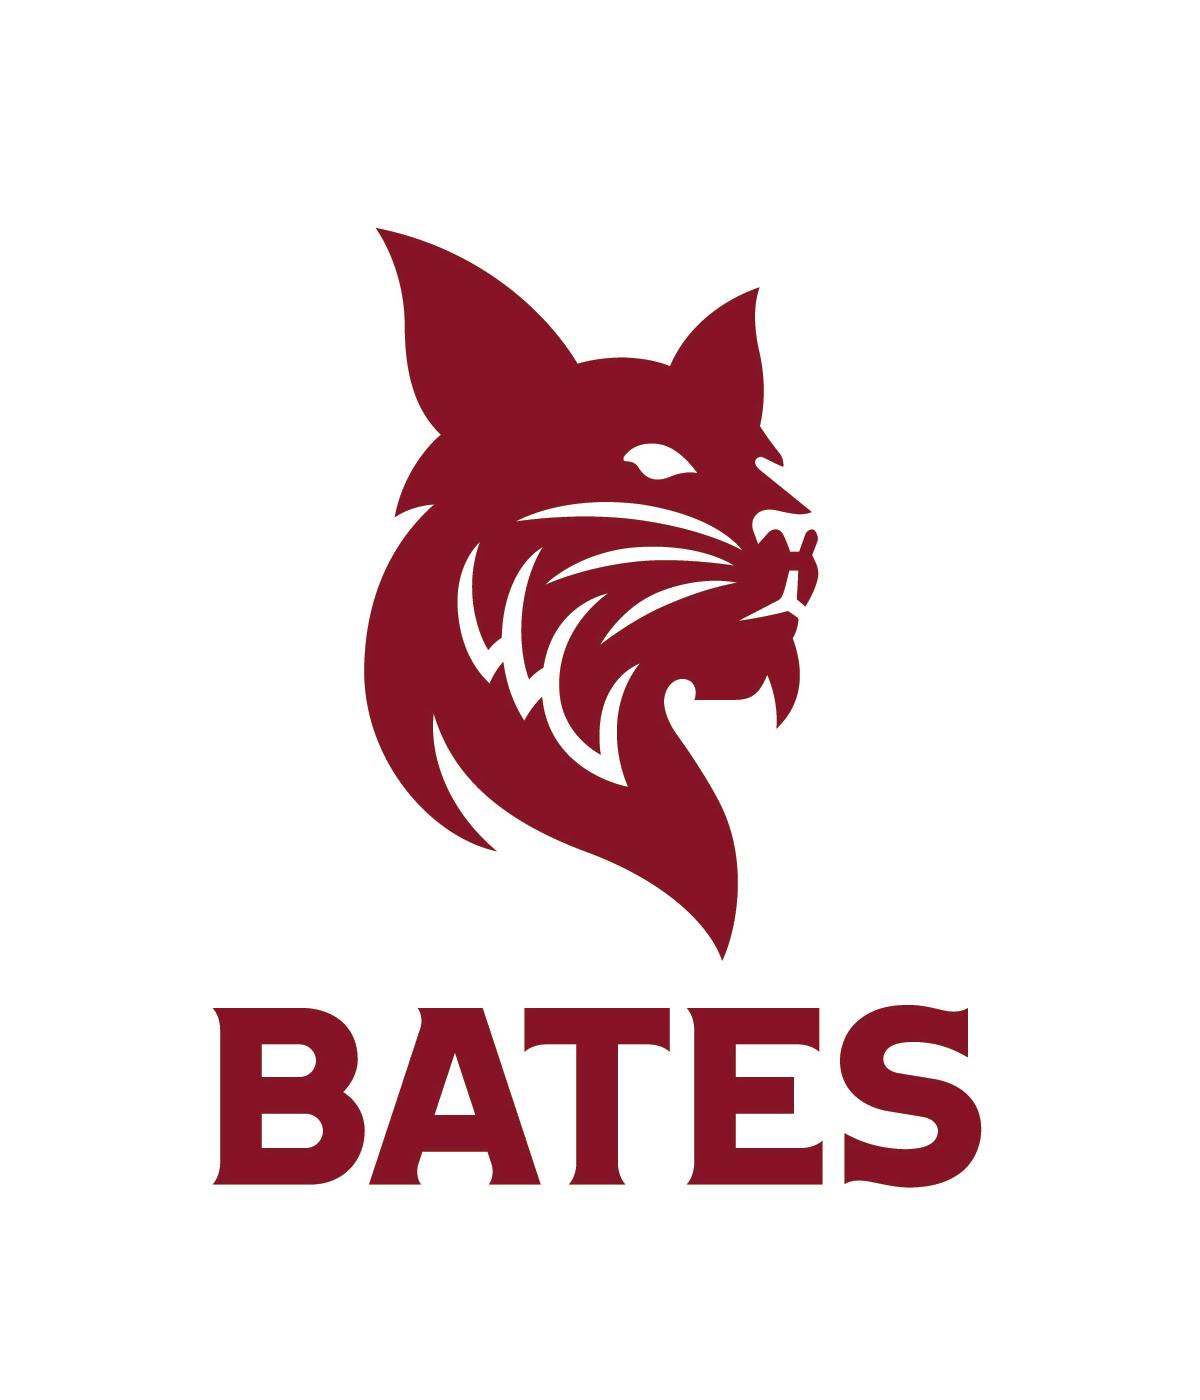 Bates, Trinity, Harvard LWT   Location: Boston, MA  Date: 3/30/19